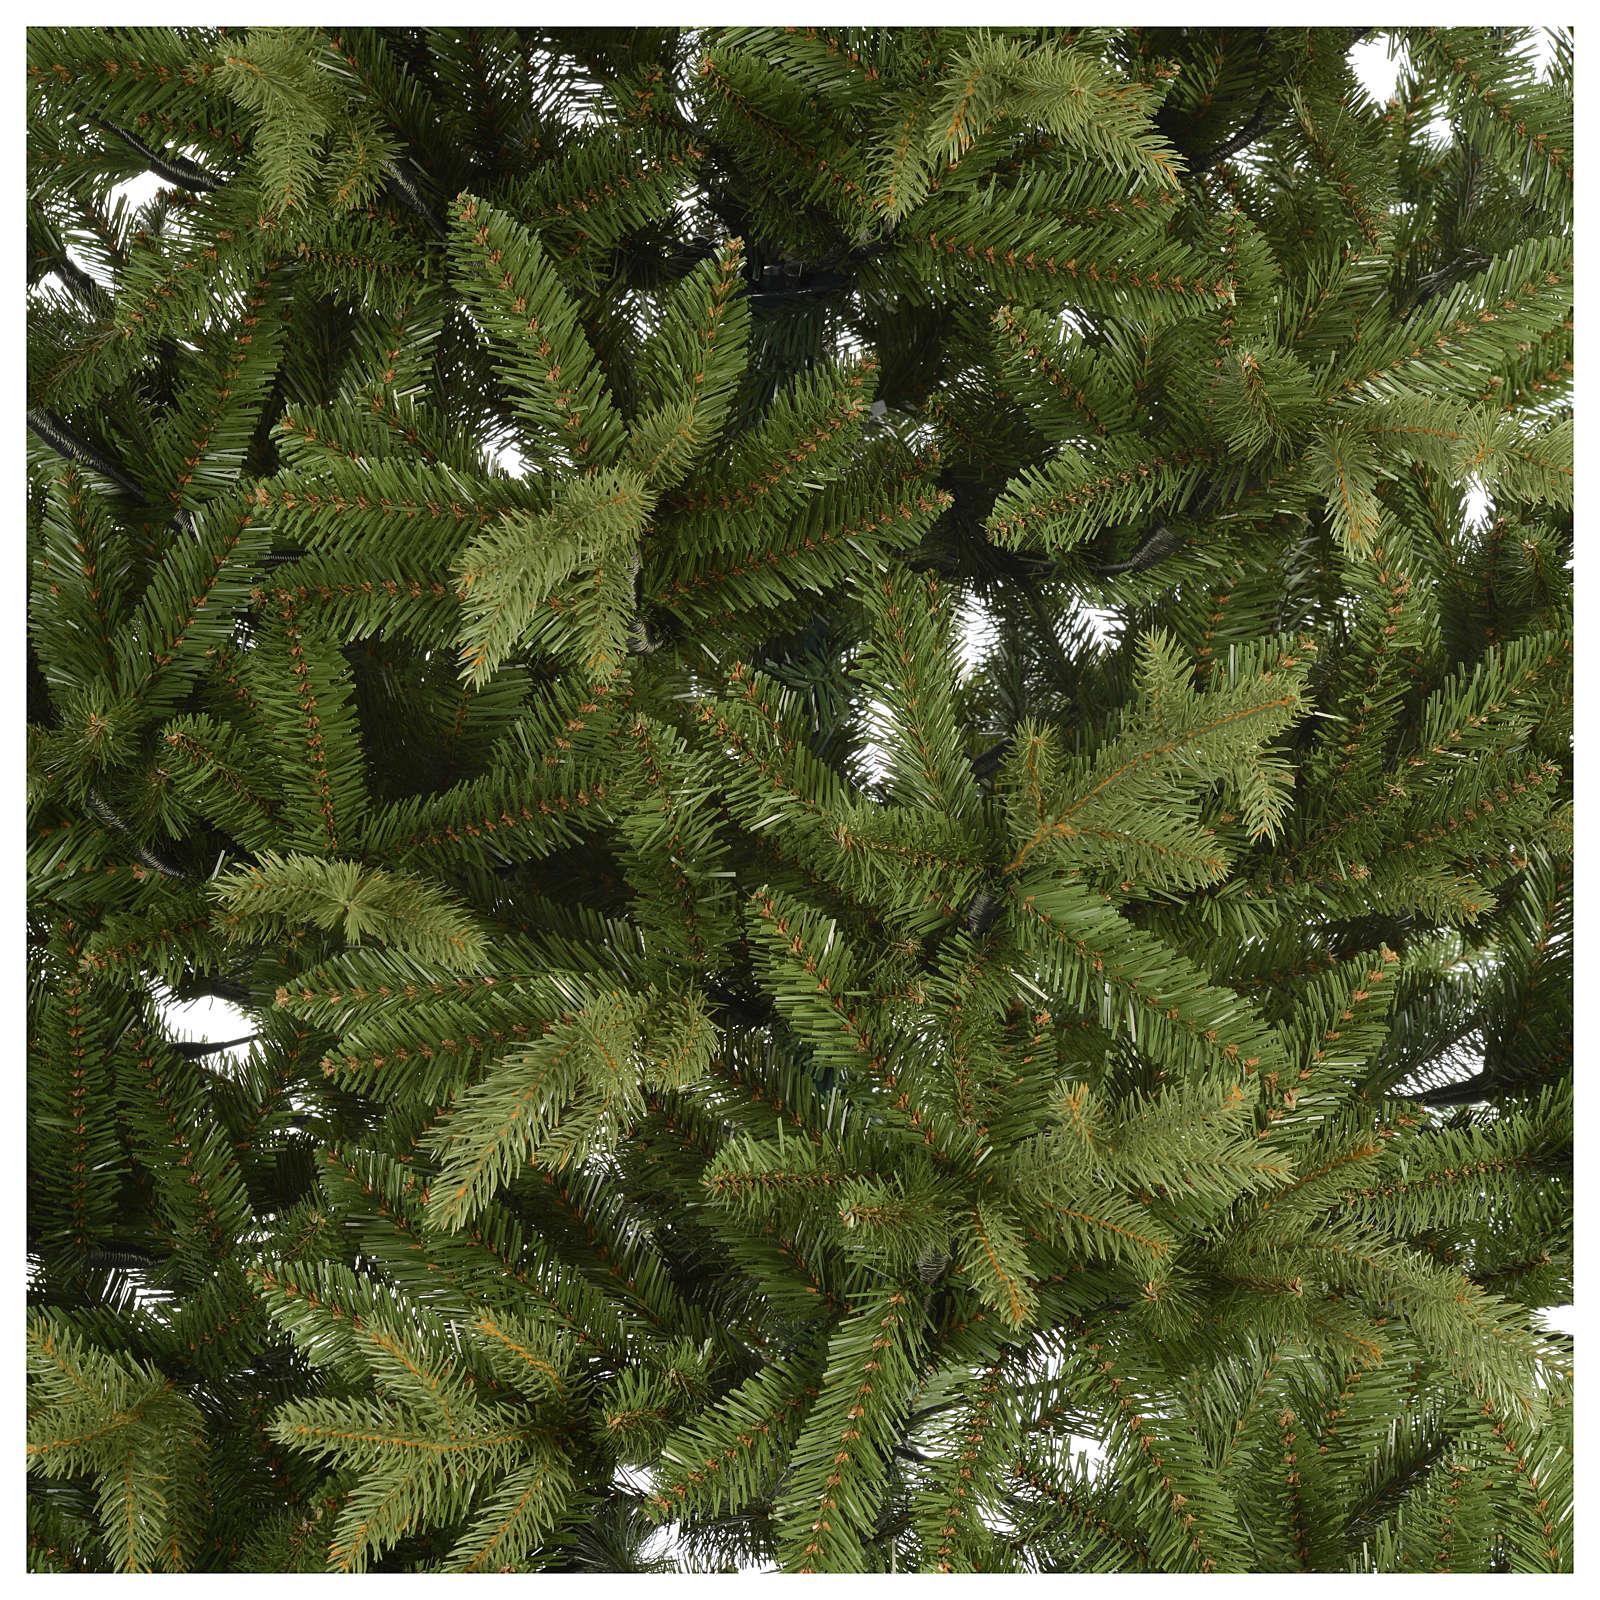 Albero di Natale 180 cm Poly verde Bloomfield Fir 3